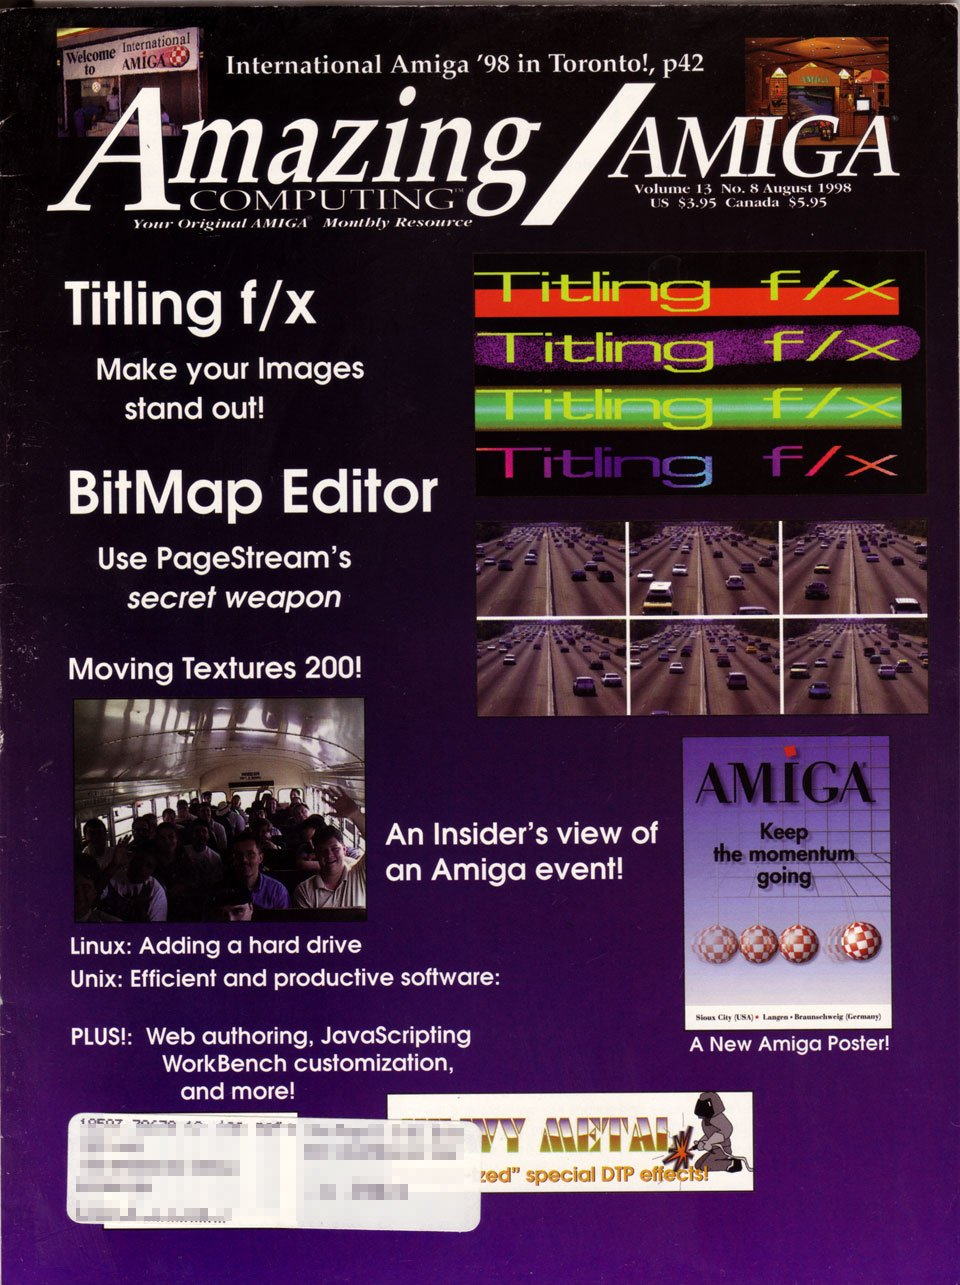 Amazing Computing Issue 146 Vol. 13 No. 08 (August 1998)